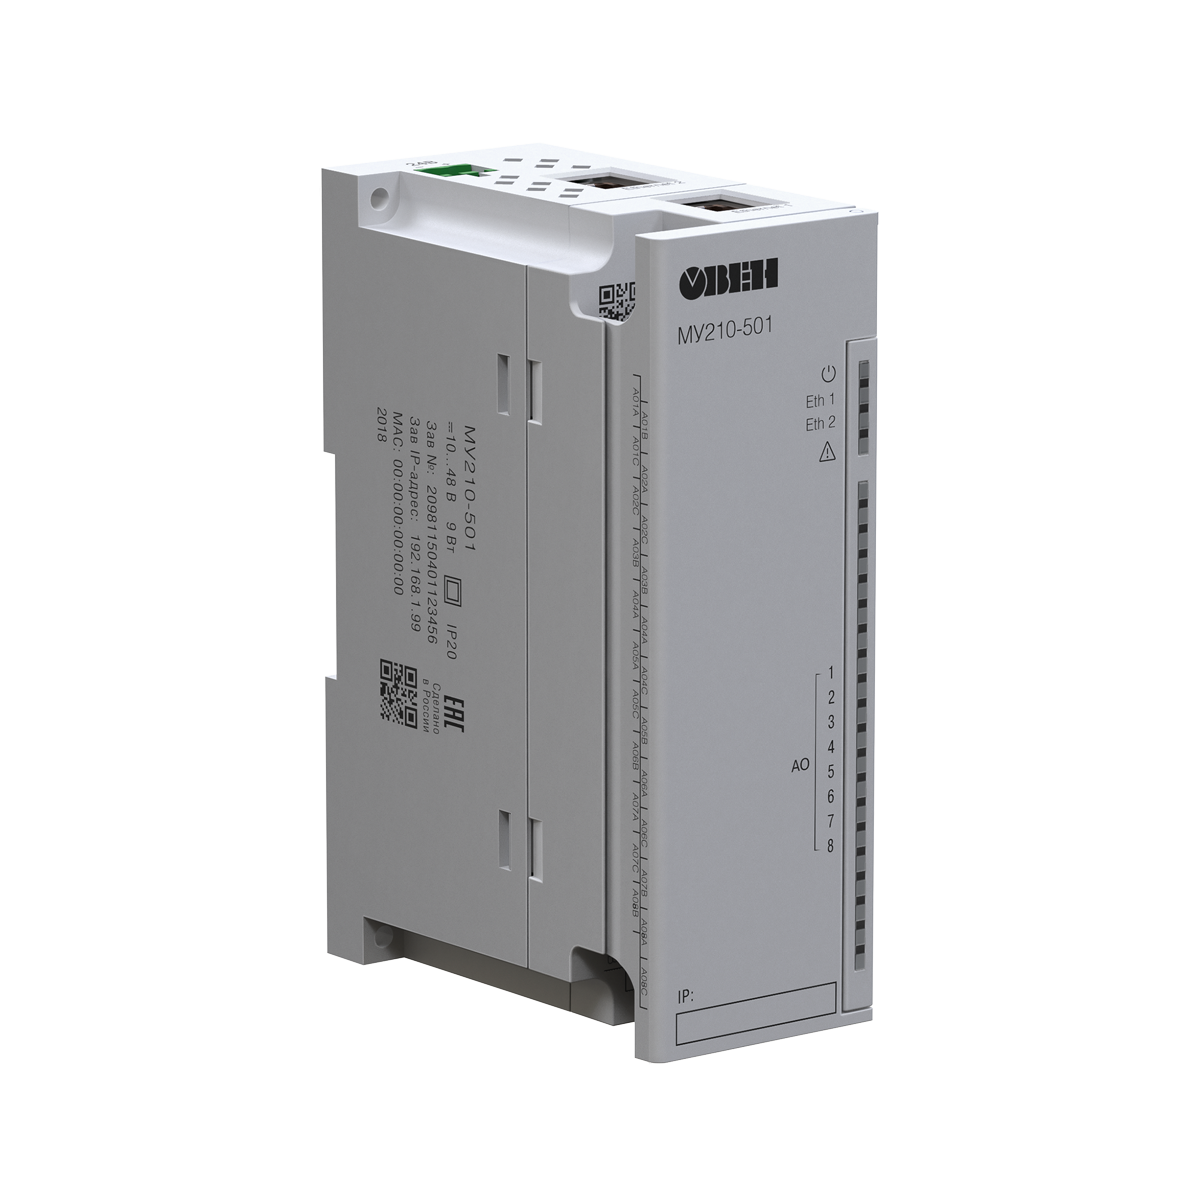 Модули аналогового вывода (Ethernet) МУ210